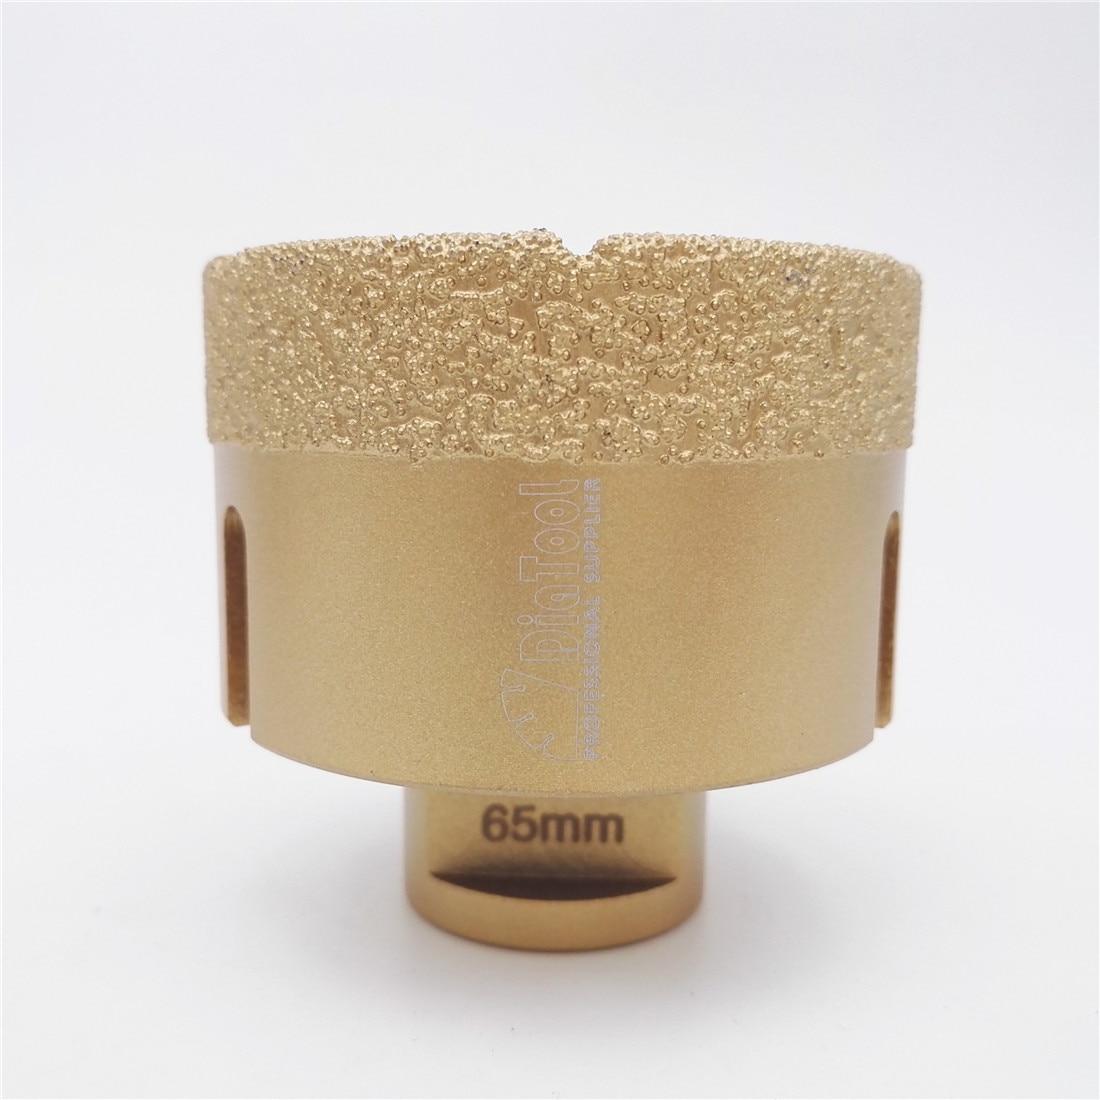 DIATOOL Diameter 65mm Vacuum Brazed Diamond Drilling Bits With15MM Diamond Height M14 Thread Drill bits Hole Saw<br>